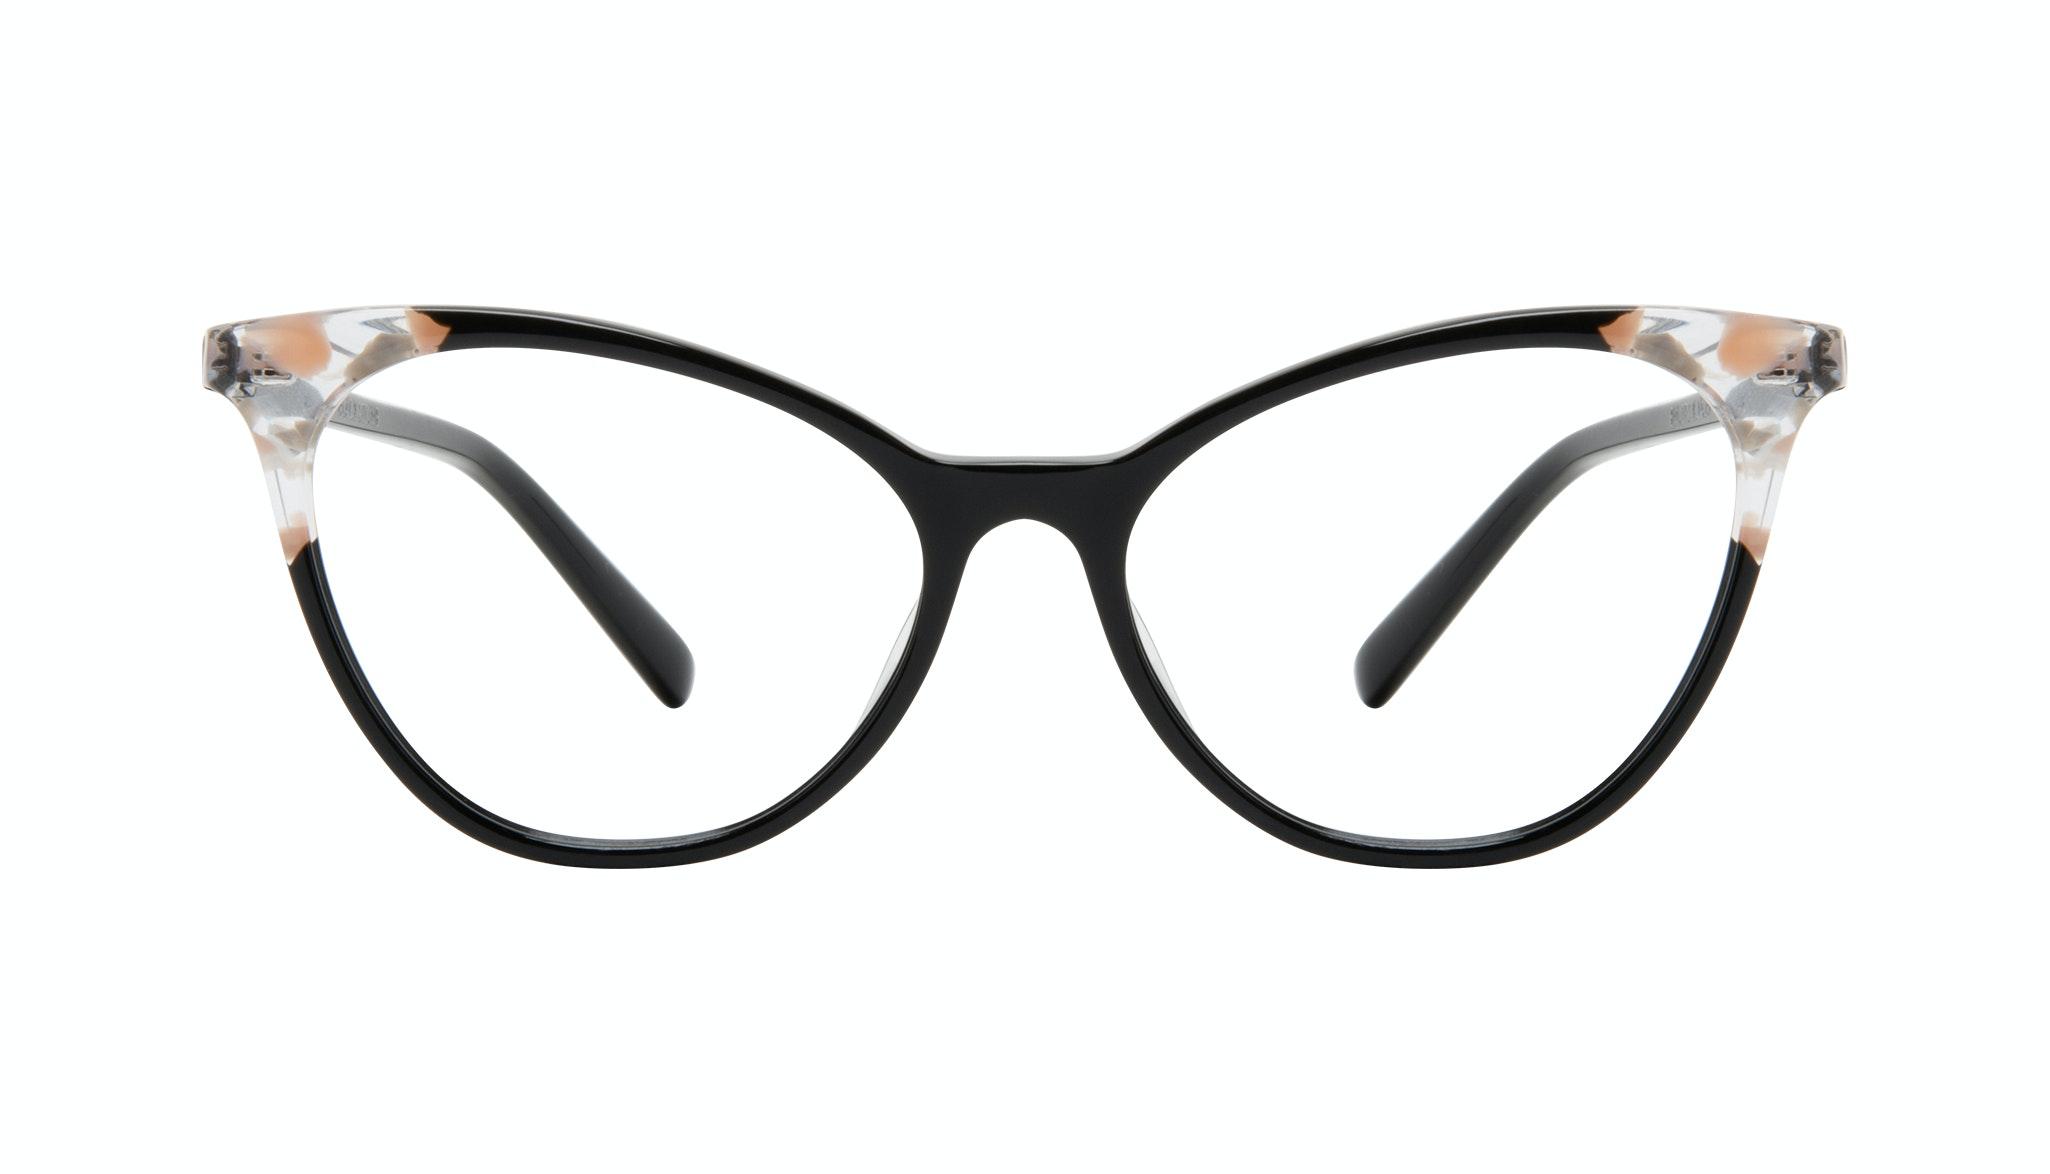 Affordable Fashion Glasses Cat Eye Eyeglasses Women Unreal Black Stone Front